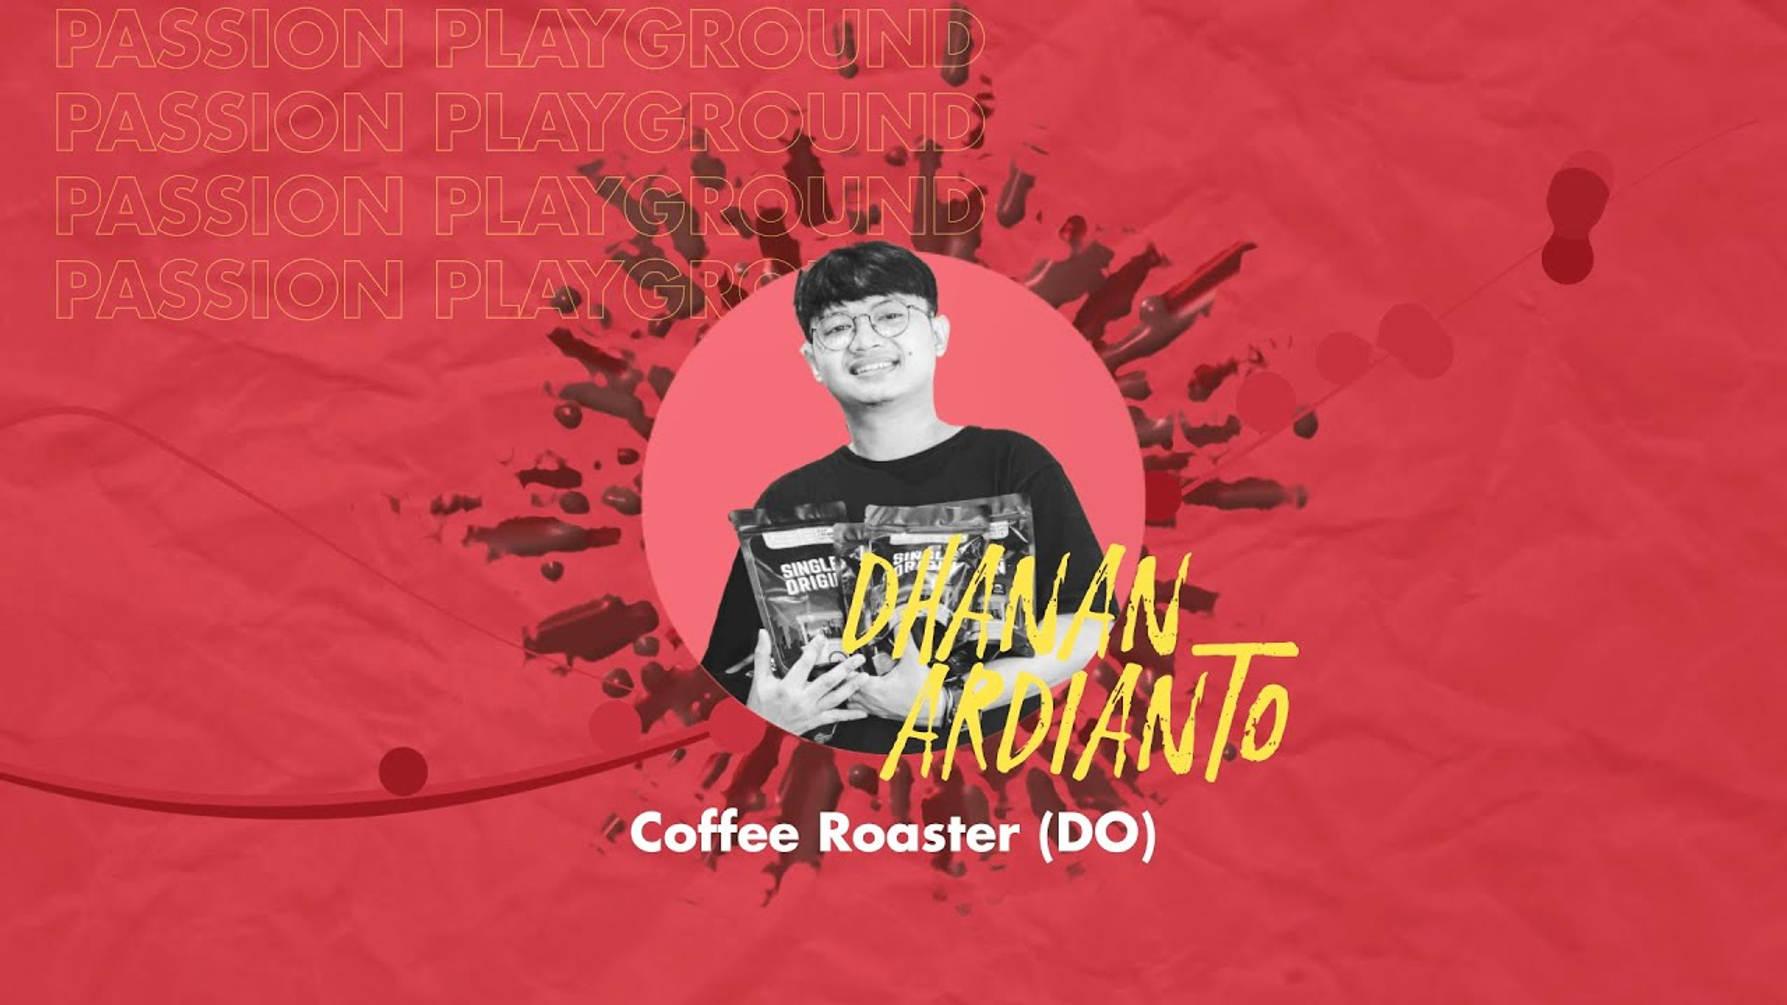 Coffee Roaster (DO) with Dhanan Ardianto